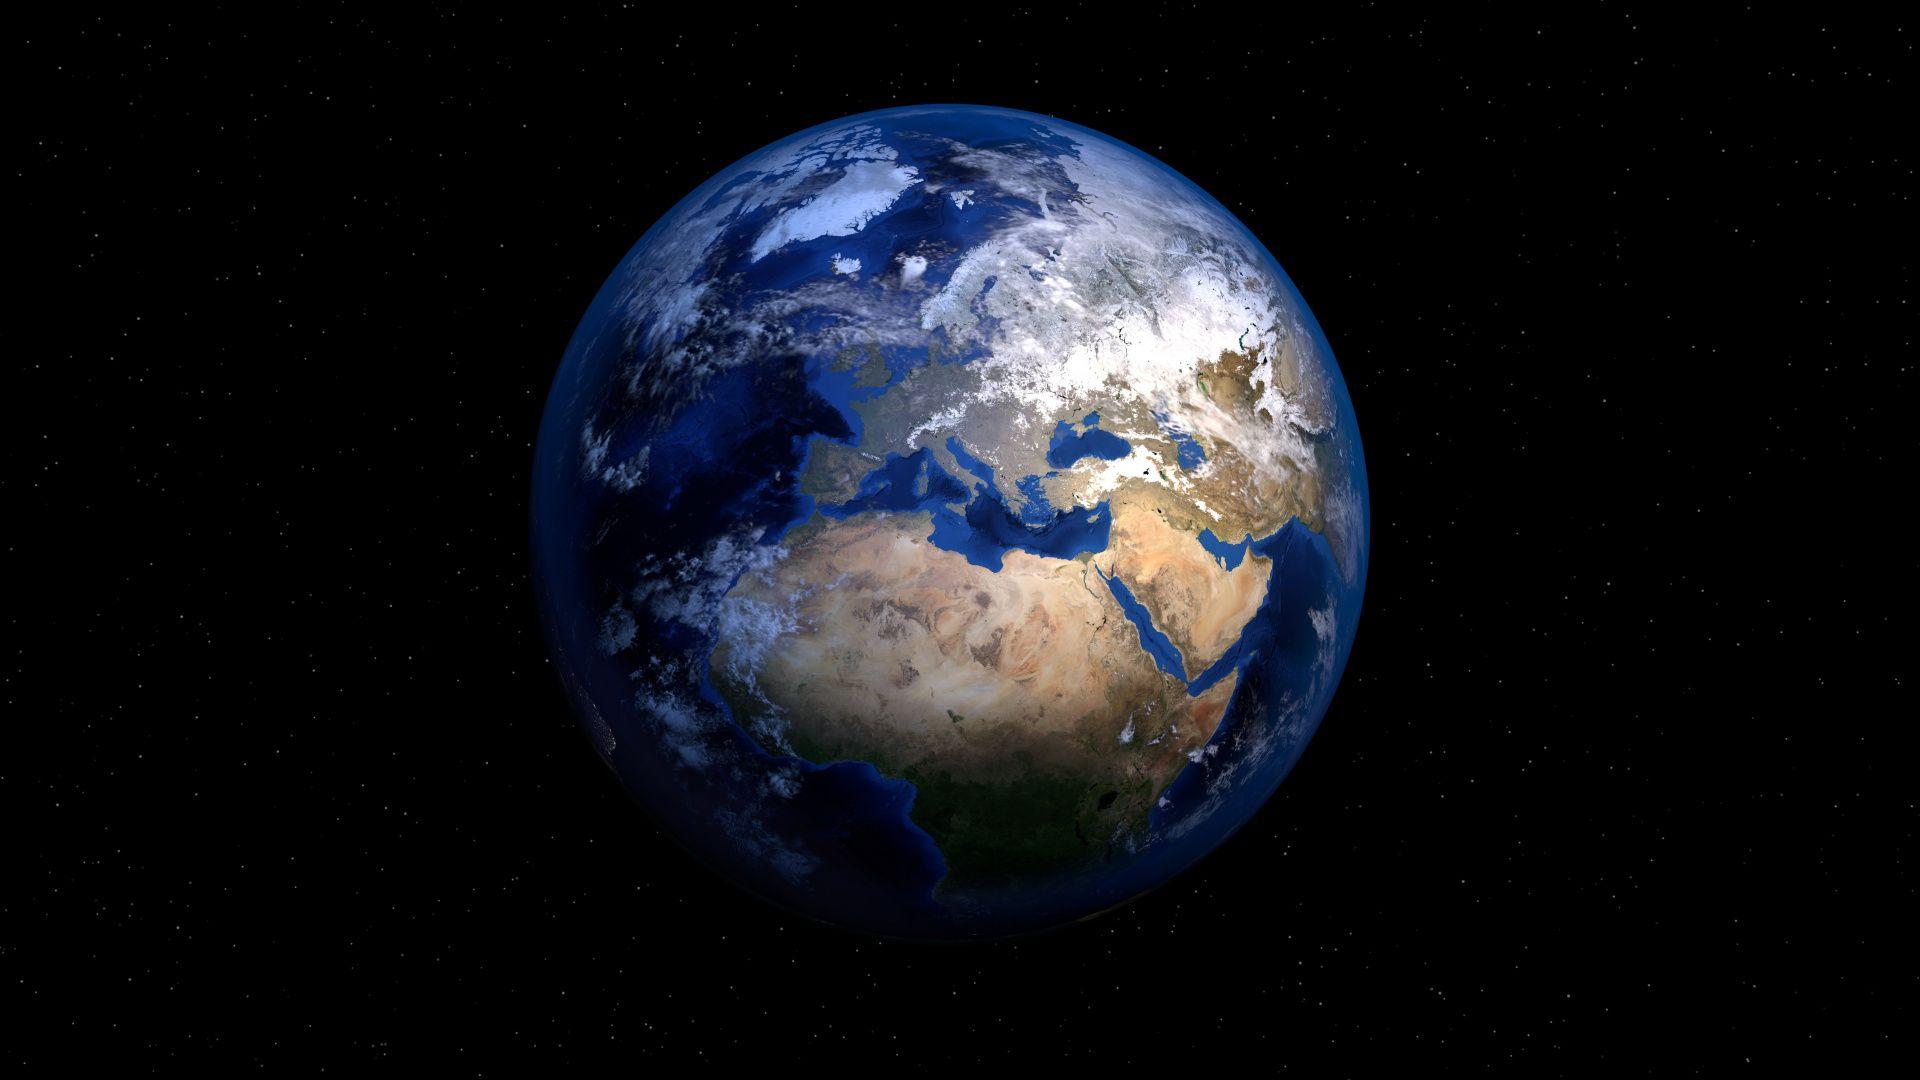 Earth wallpaper 1080p